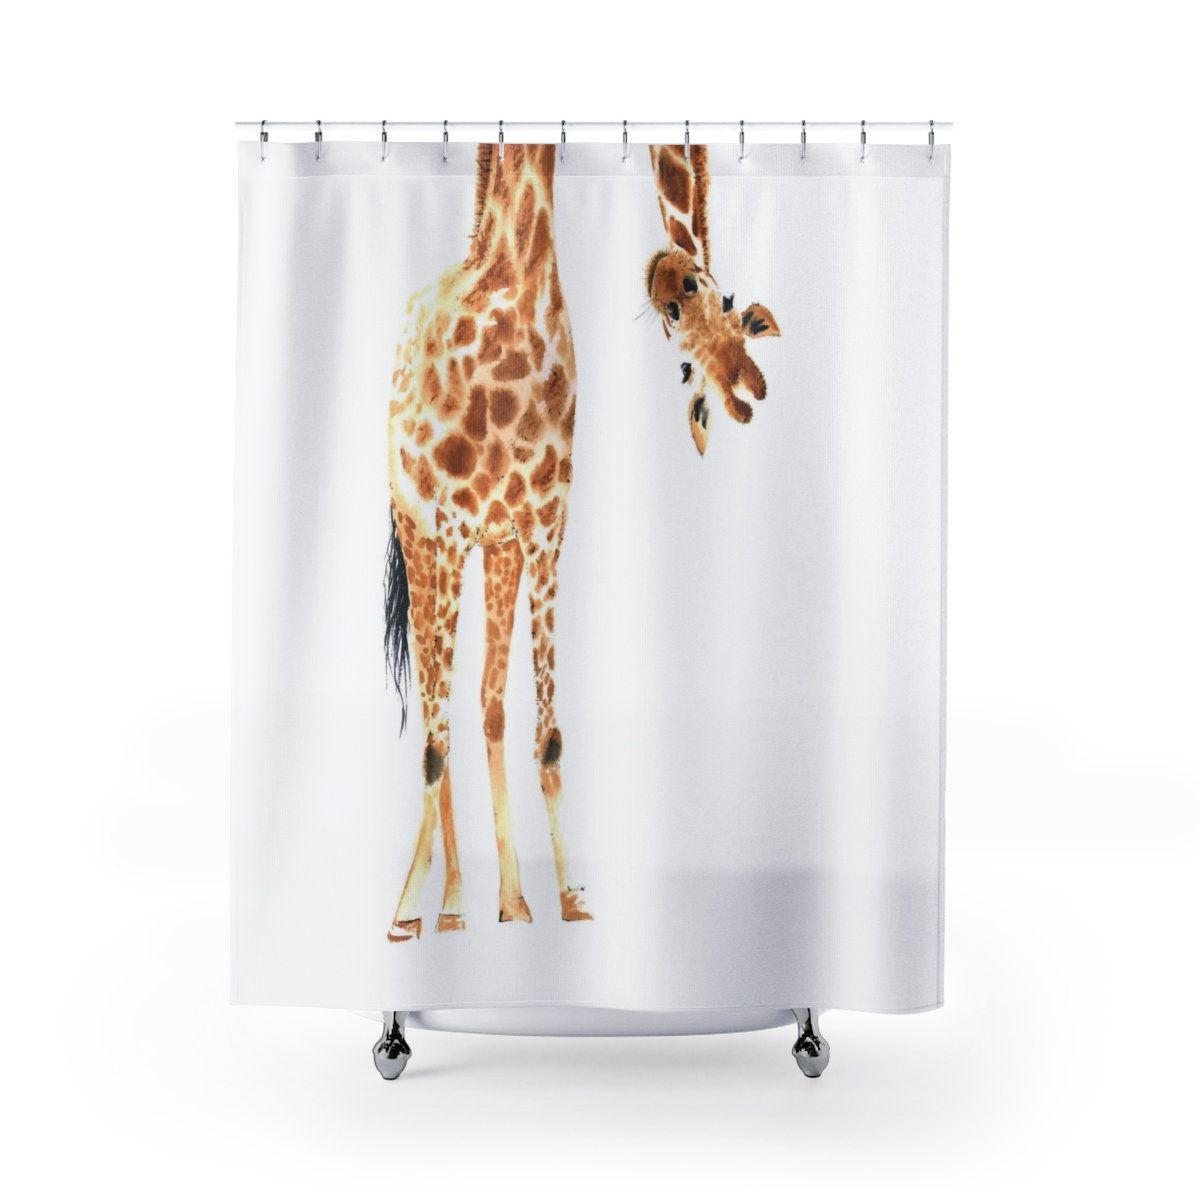 Toilettensitz Giraffe